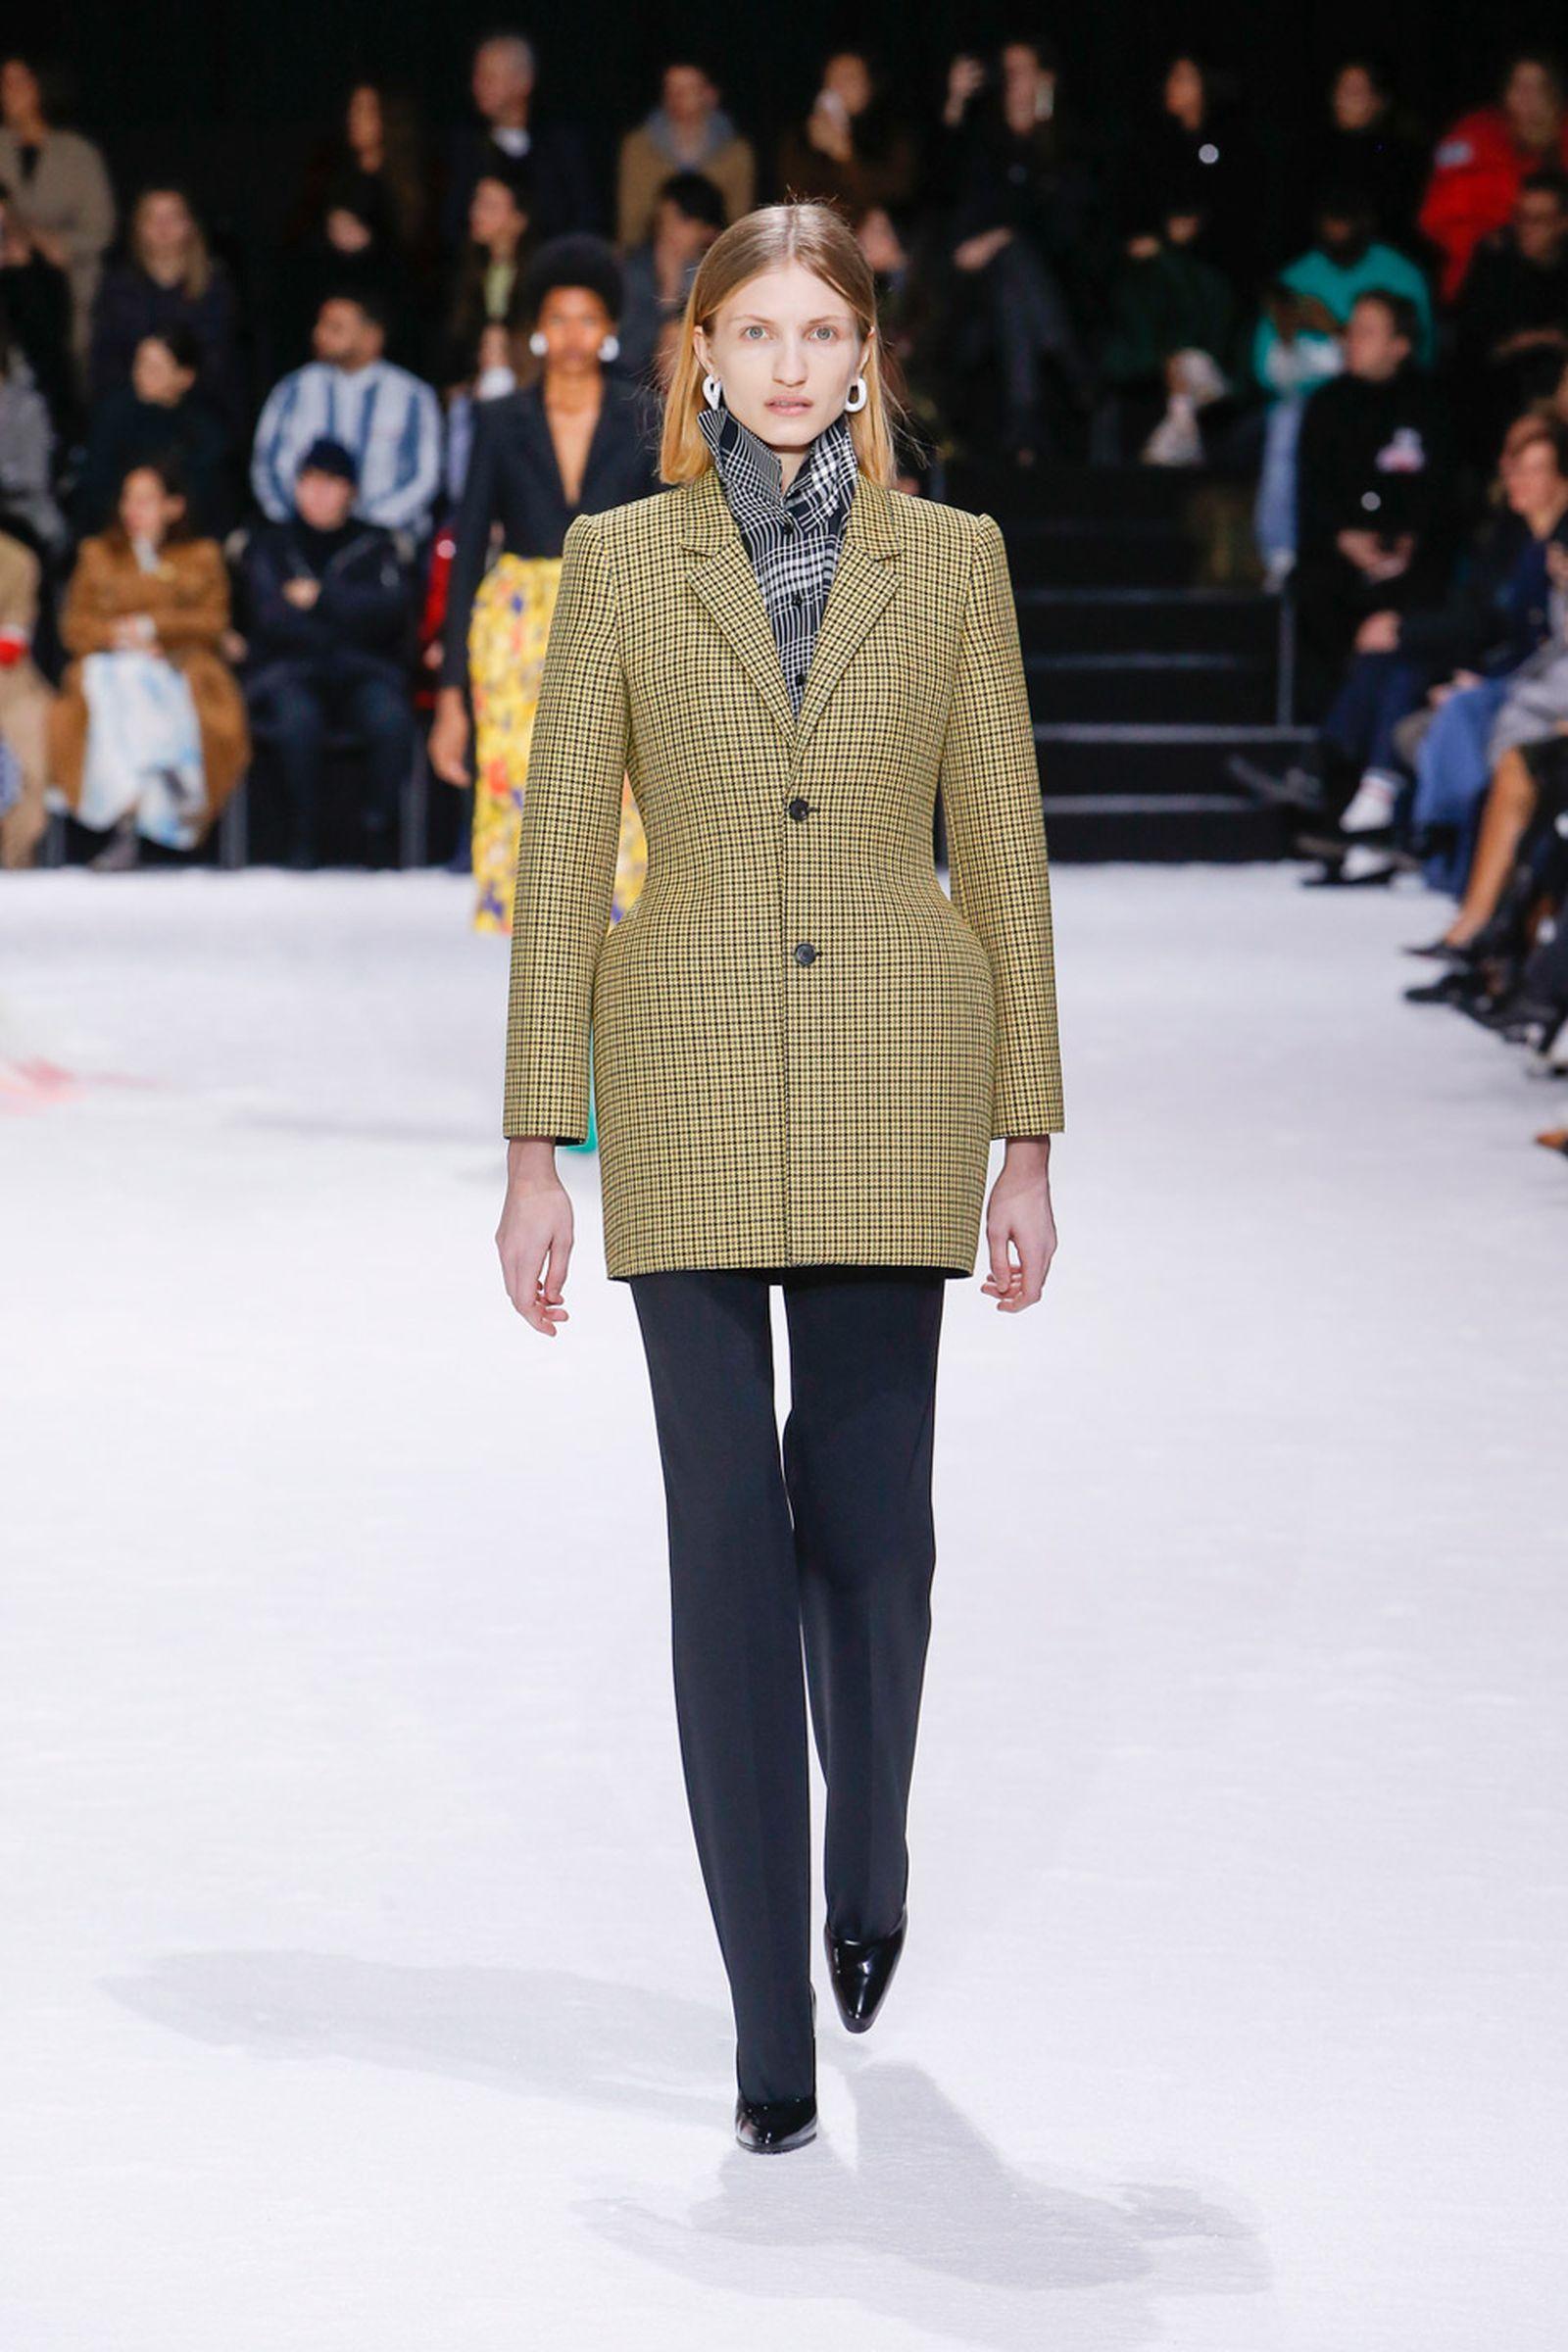 balenciaga fw18 Fall/WInter 2018 paris fashion week runway